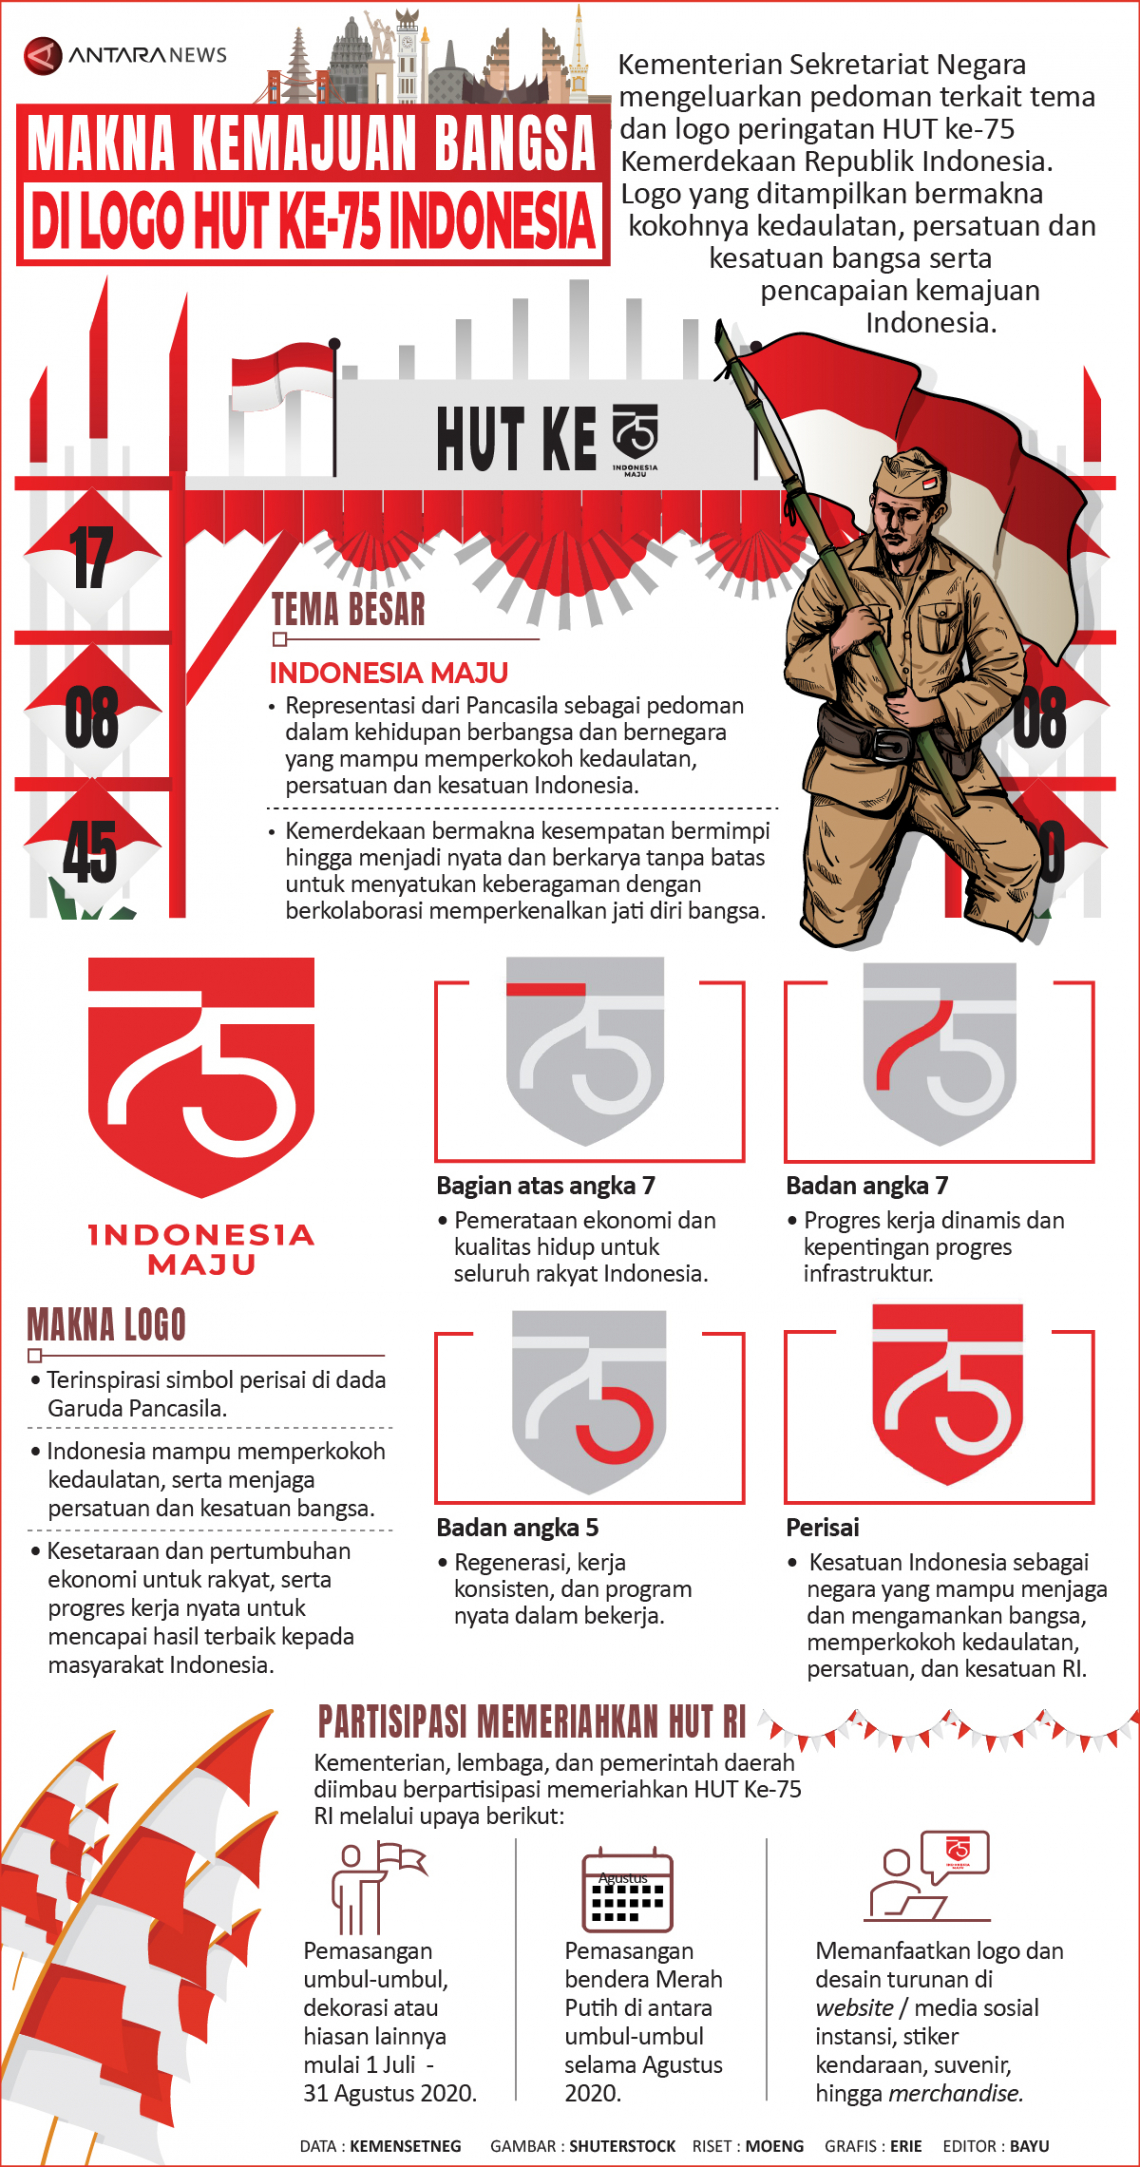 Makna kemajuan di logo HUT Ke-75 Indonesia